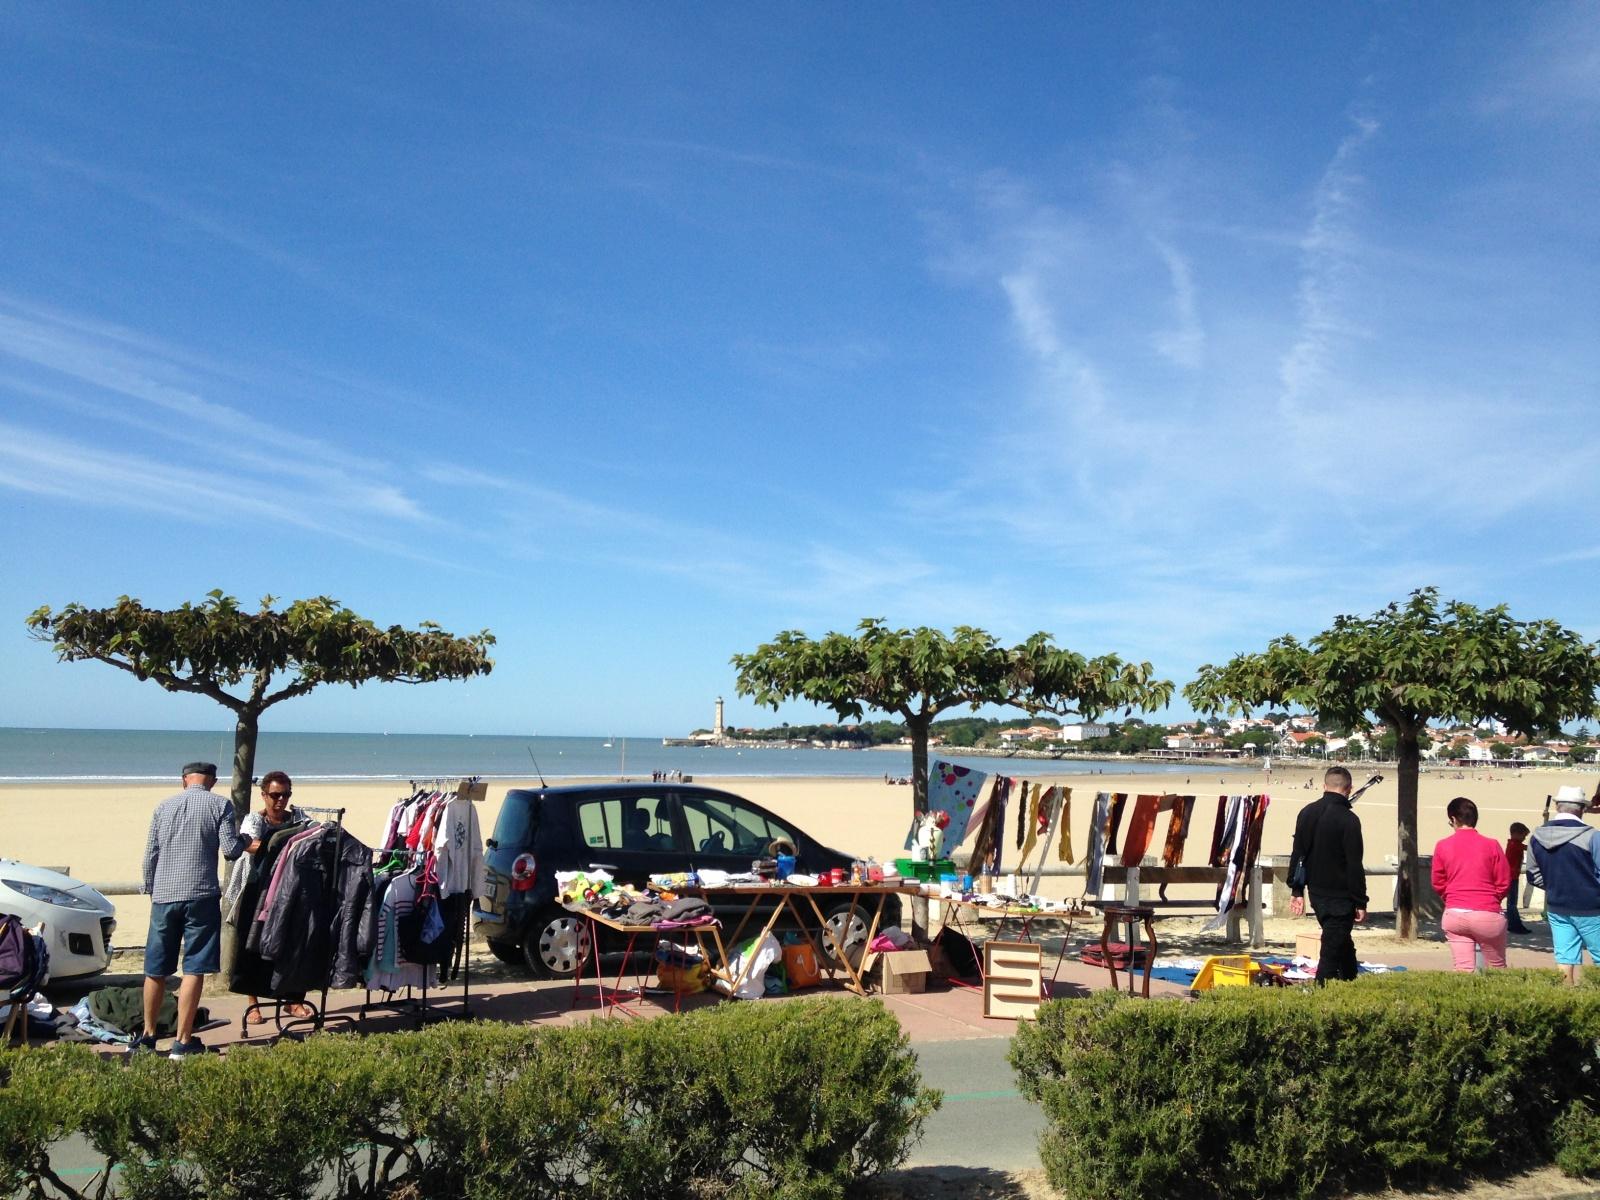 Brocante Beach St. Georges de Didonne Charente Martime